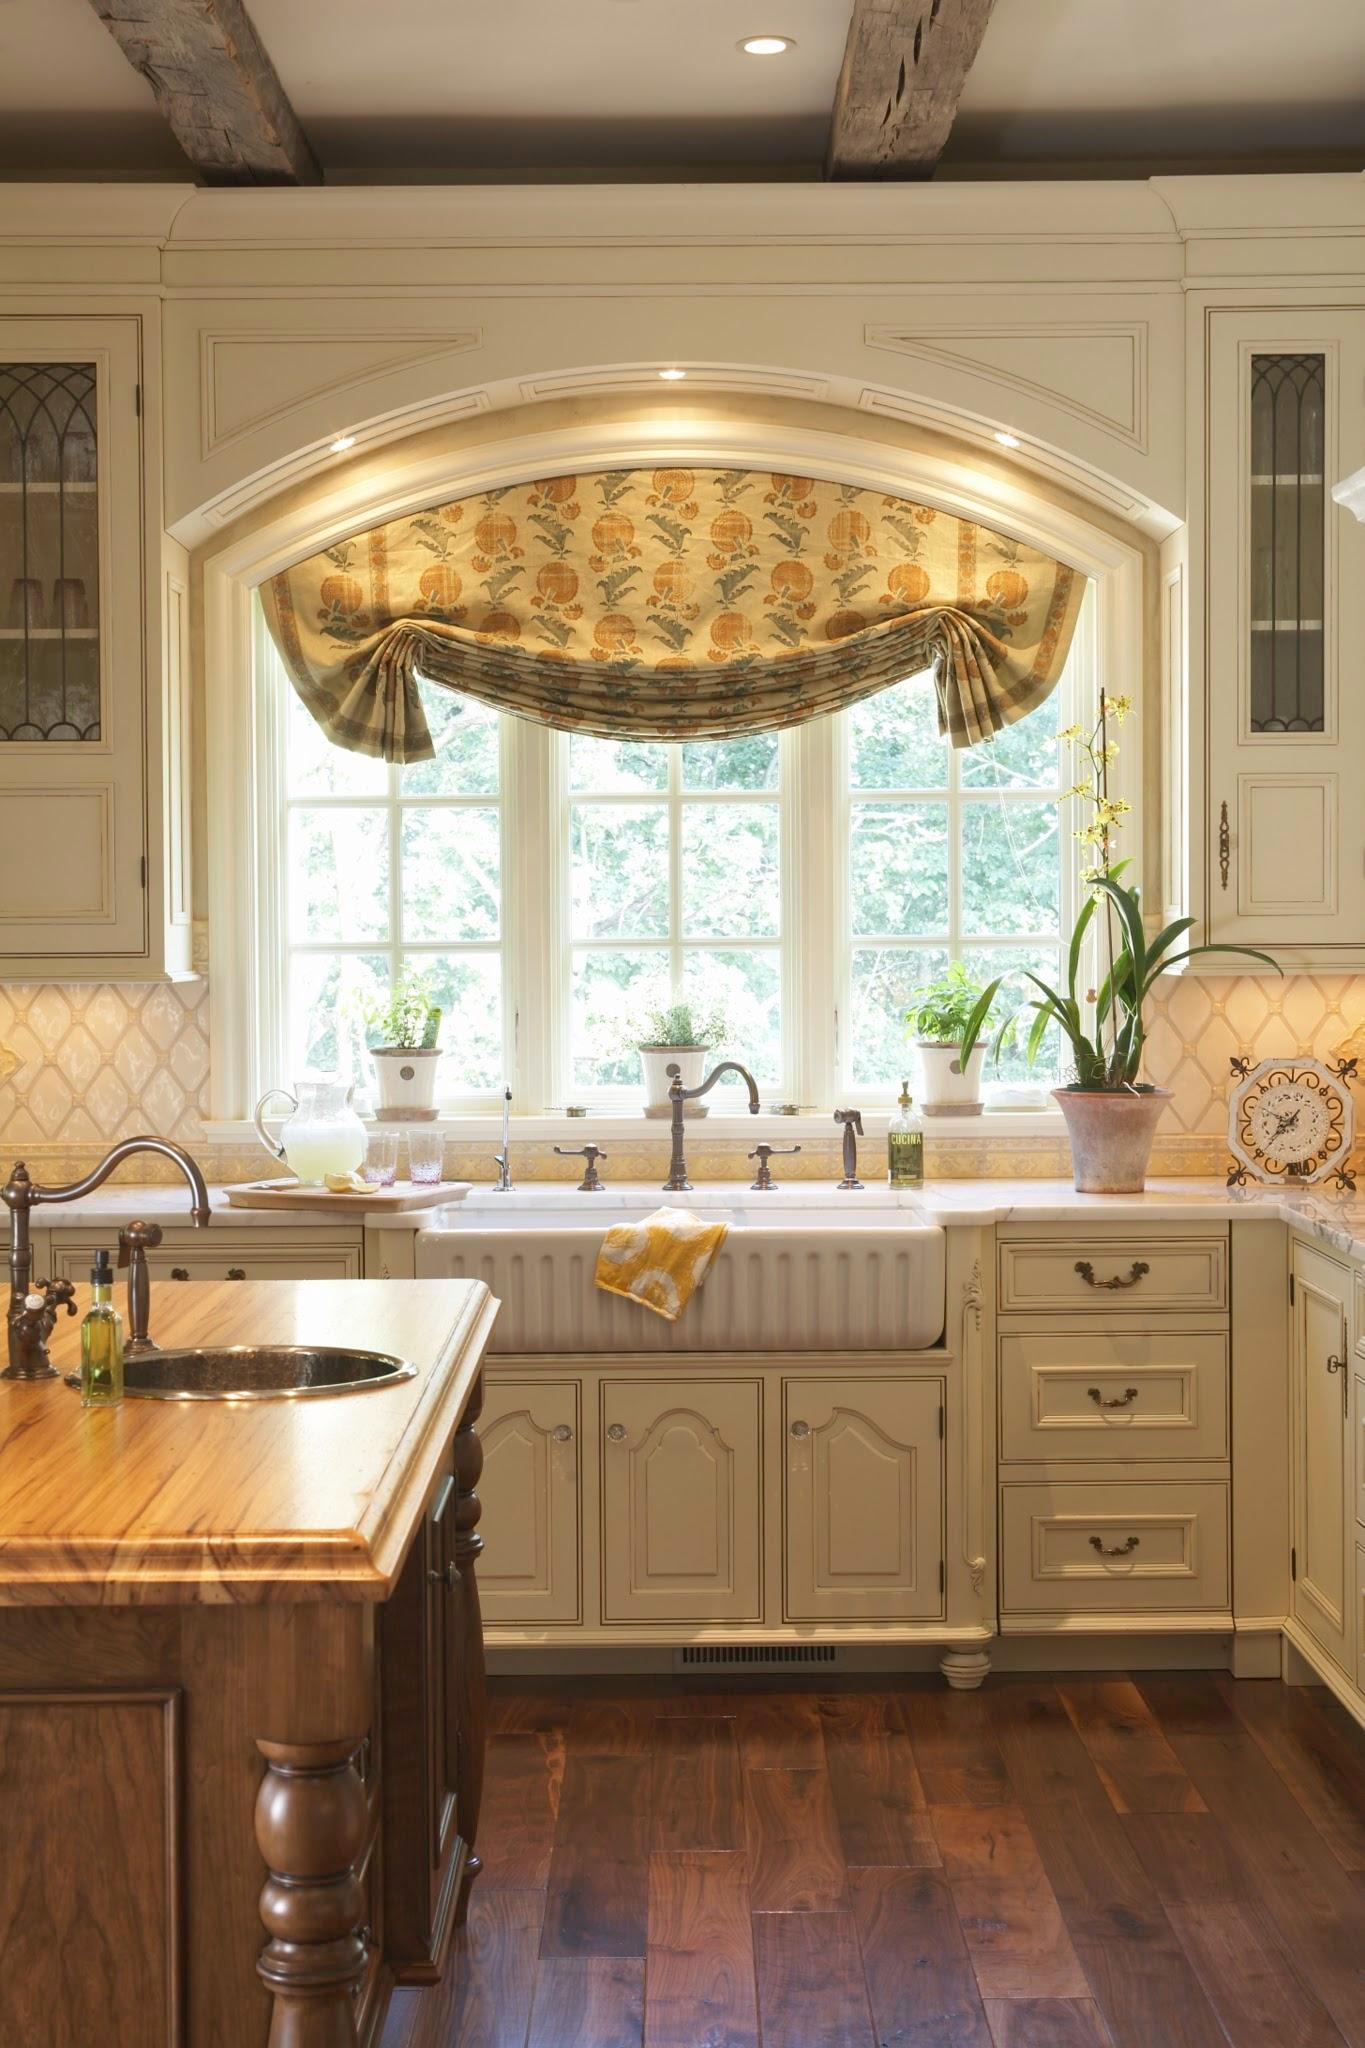 Оформление арочного окна на кухне